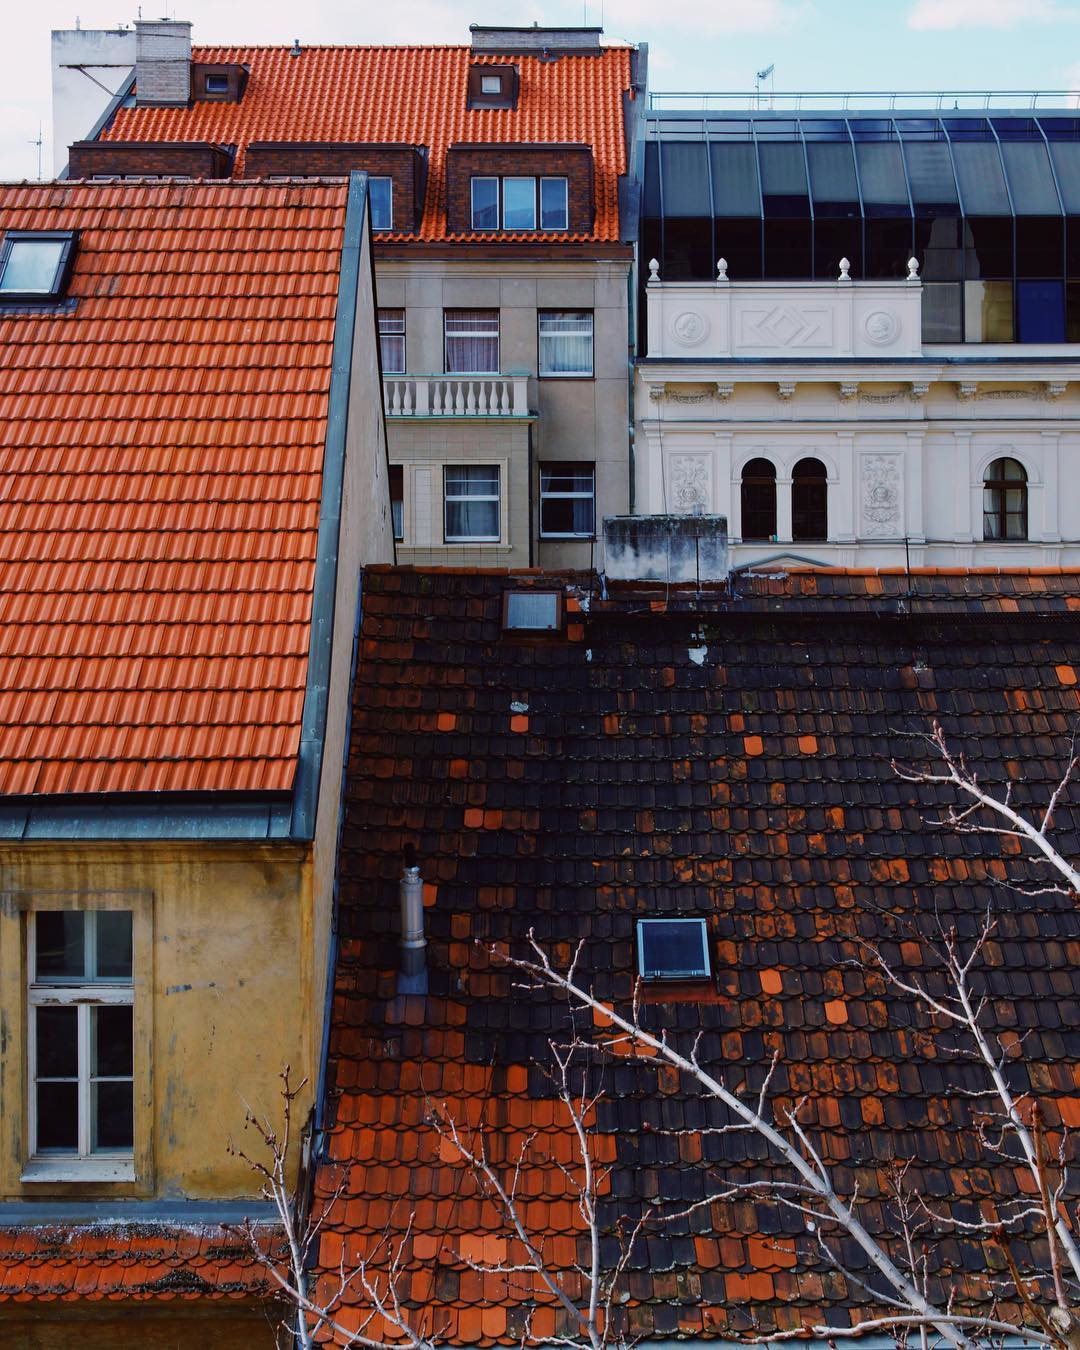 Polina-Shubkina-Prague-Photographer-007.jpeg